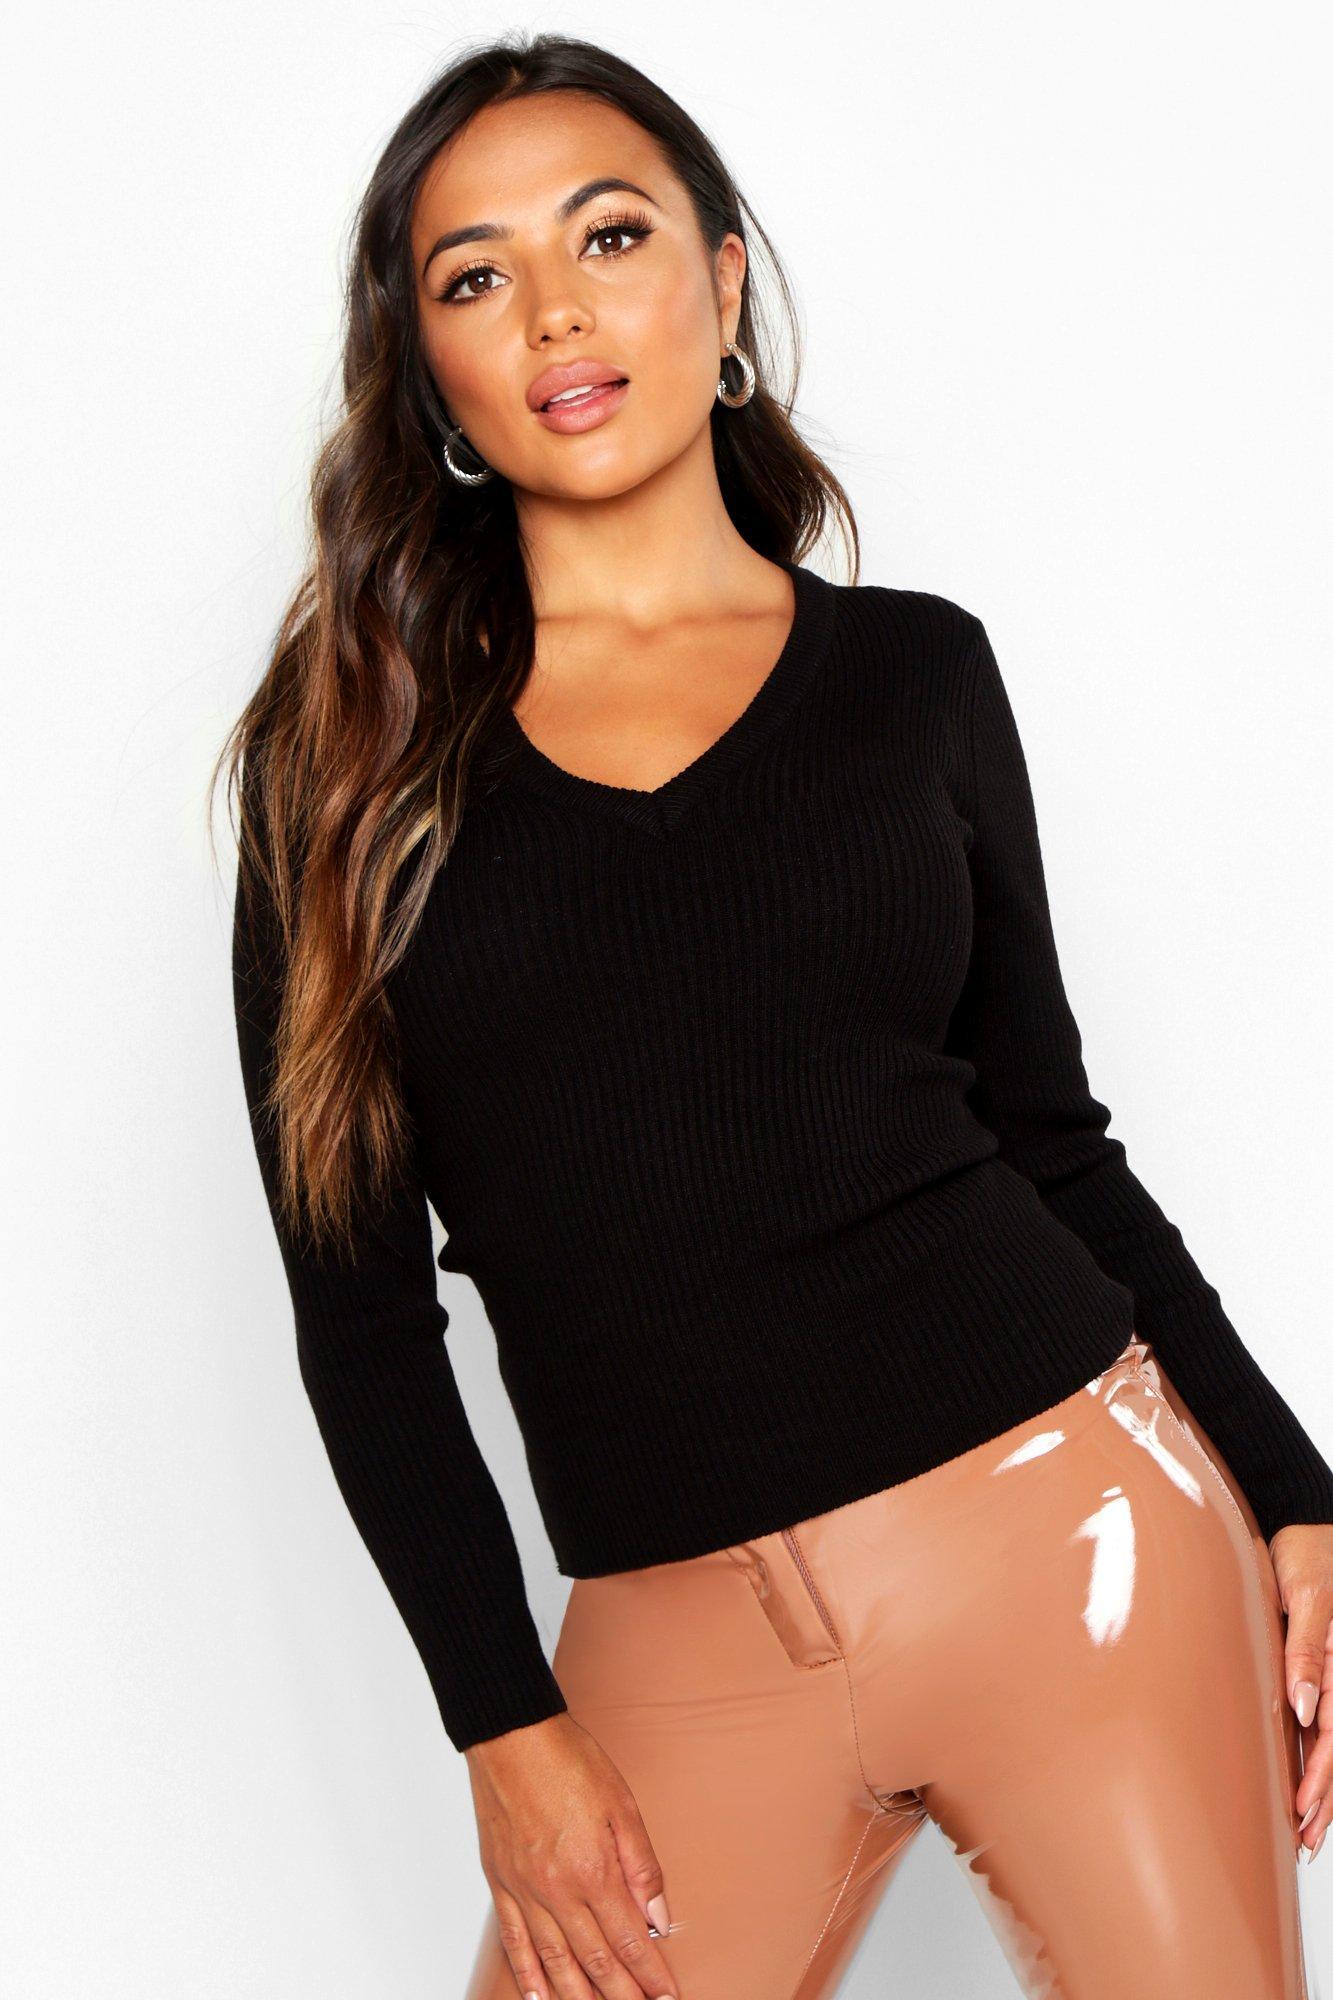 Womens Petite gerippter Pullover mit V-Ausschnitt - schwarz - L, Schwarz - Boohoo.com